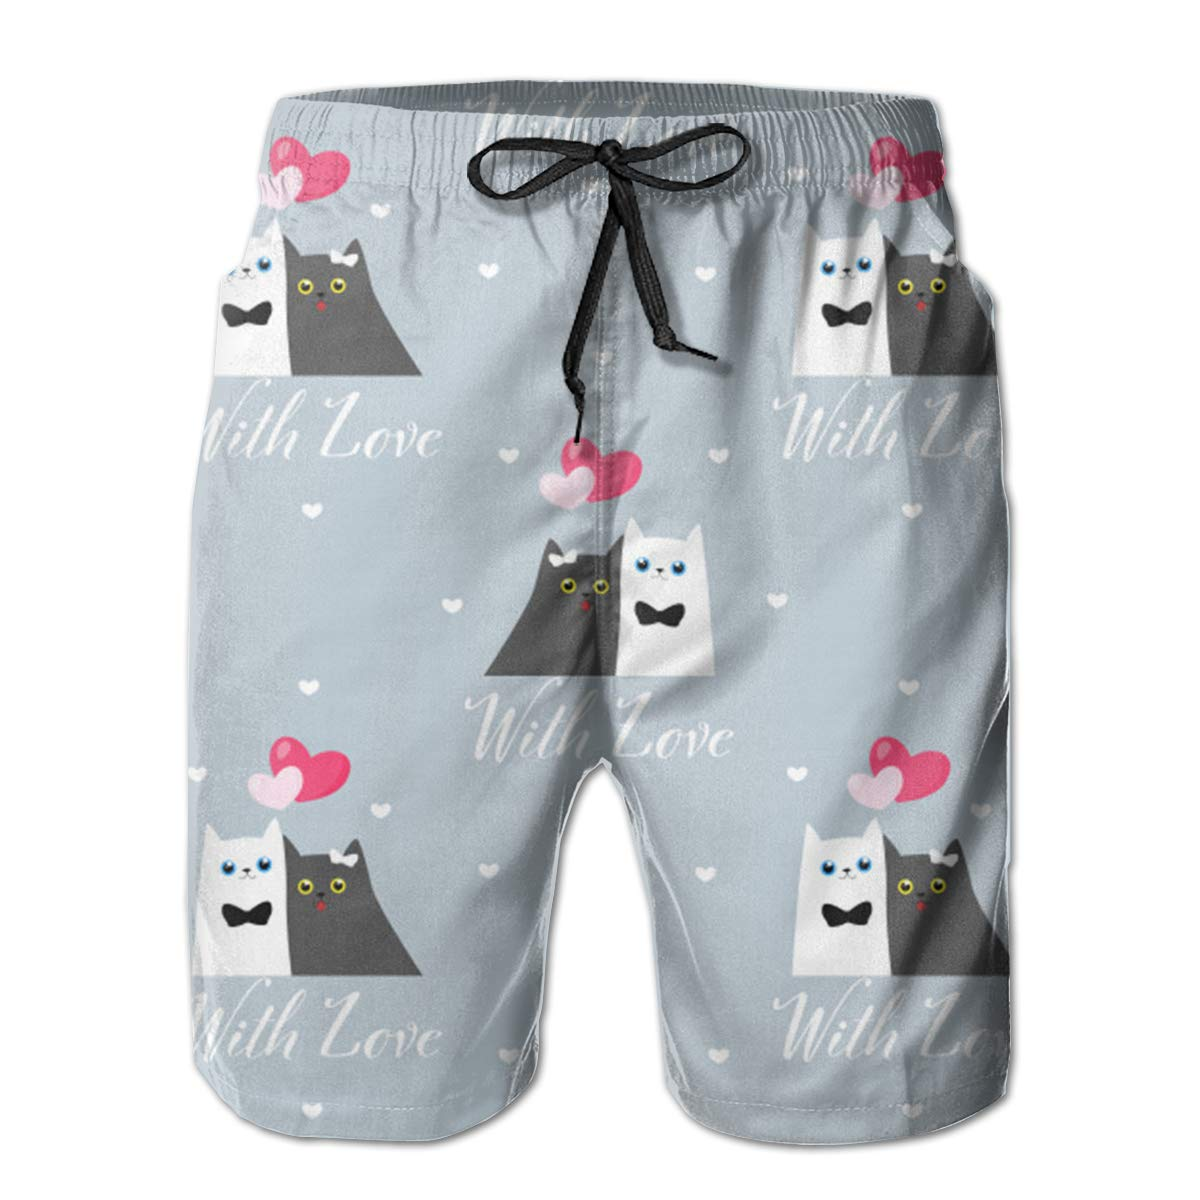 with Love Swim Shorts Mens Swim Trunks Beach Shorts Board Shorts